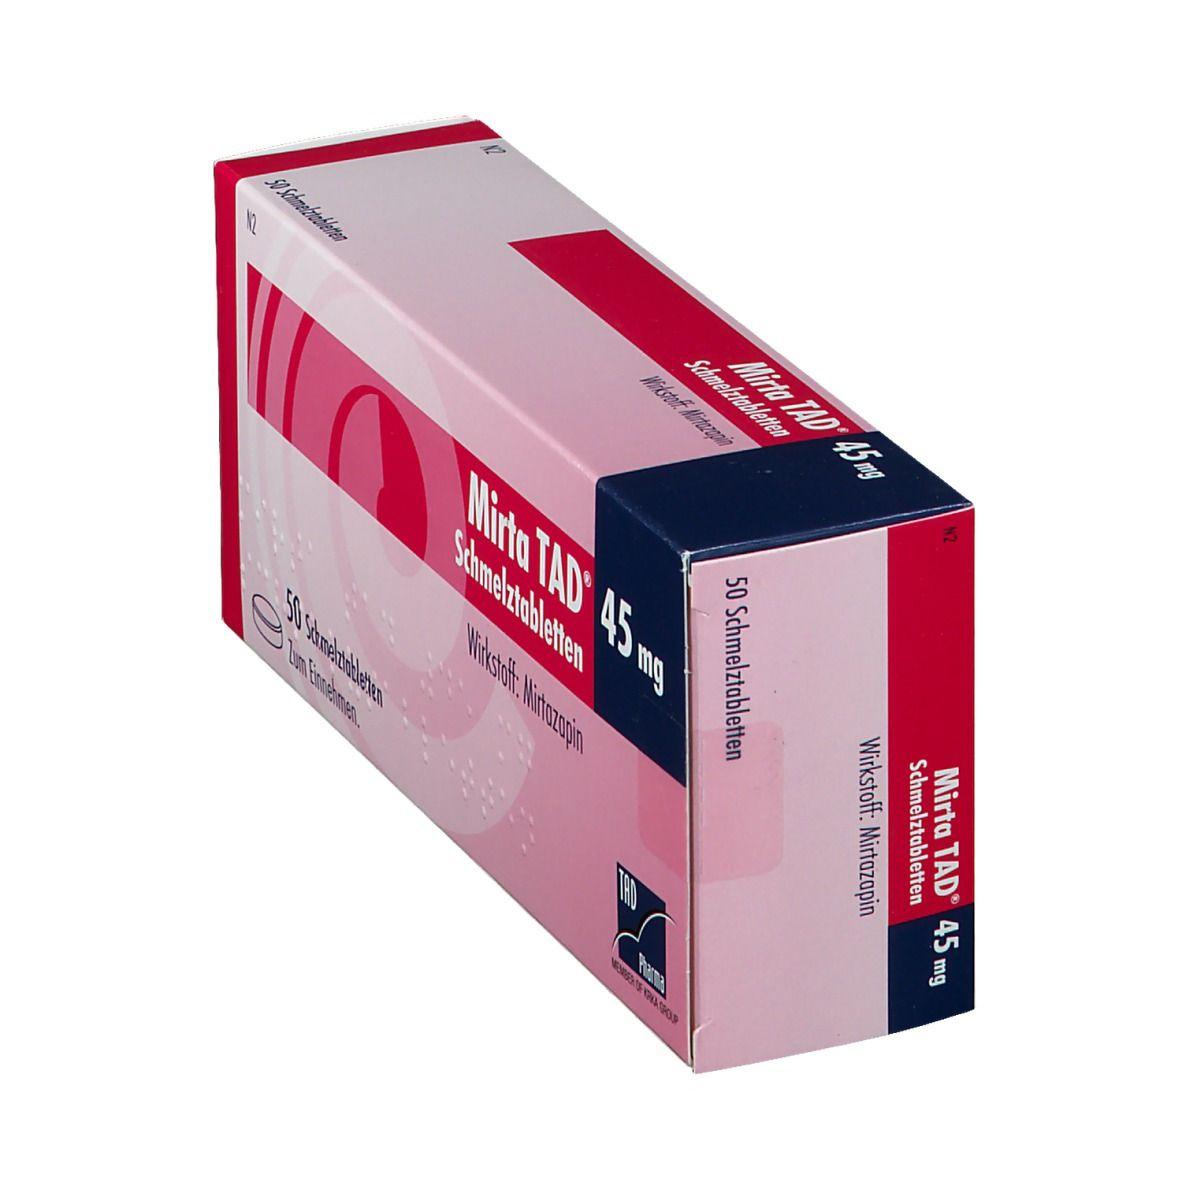 MIRTA TAD 45MG SCHMELZTABL 50 St - shop-apotheke.com